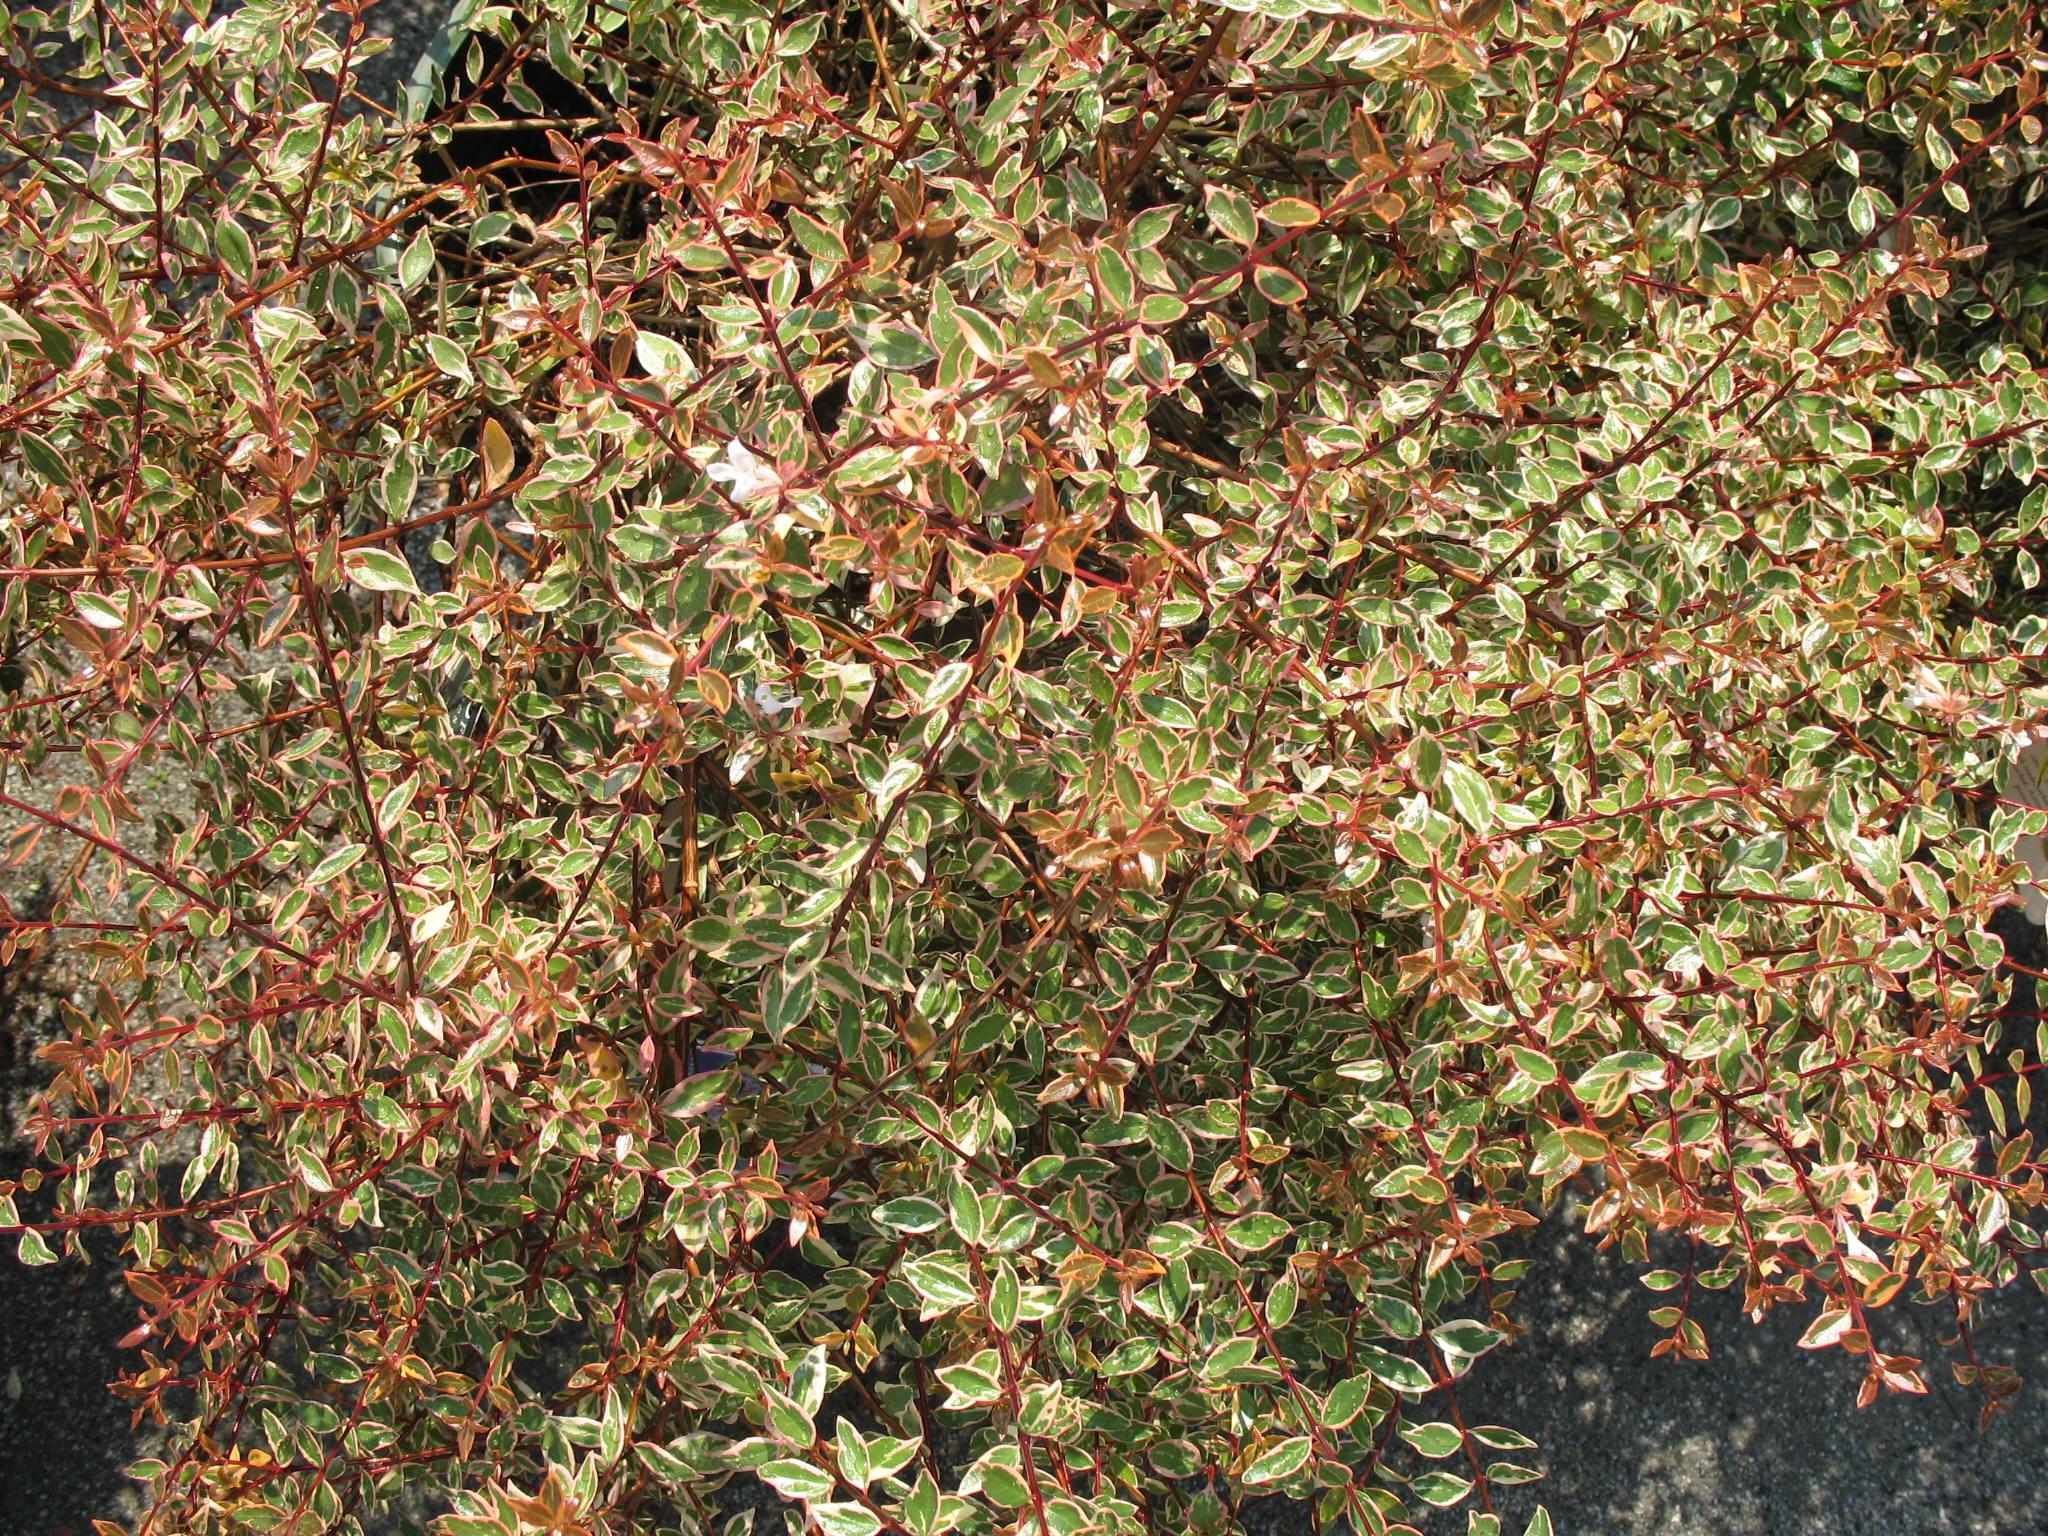 Abelia x grandiflora 'Sunrise' / Abelia x grandiflora 'Sunrise'